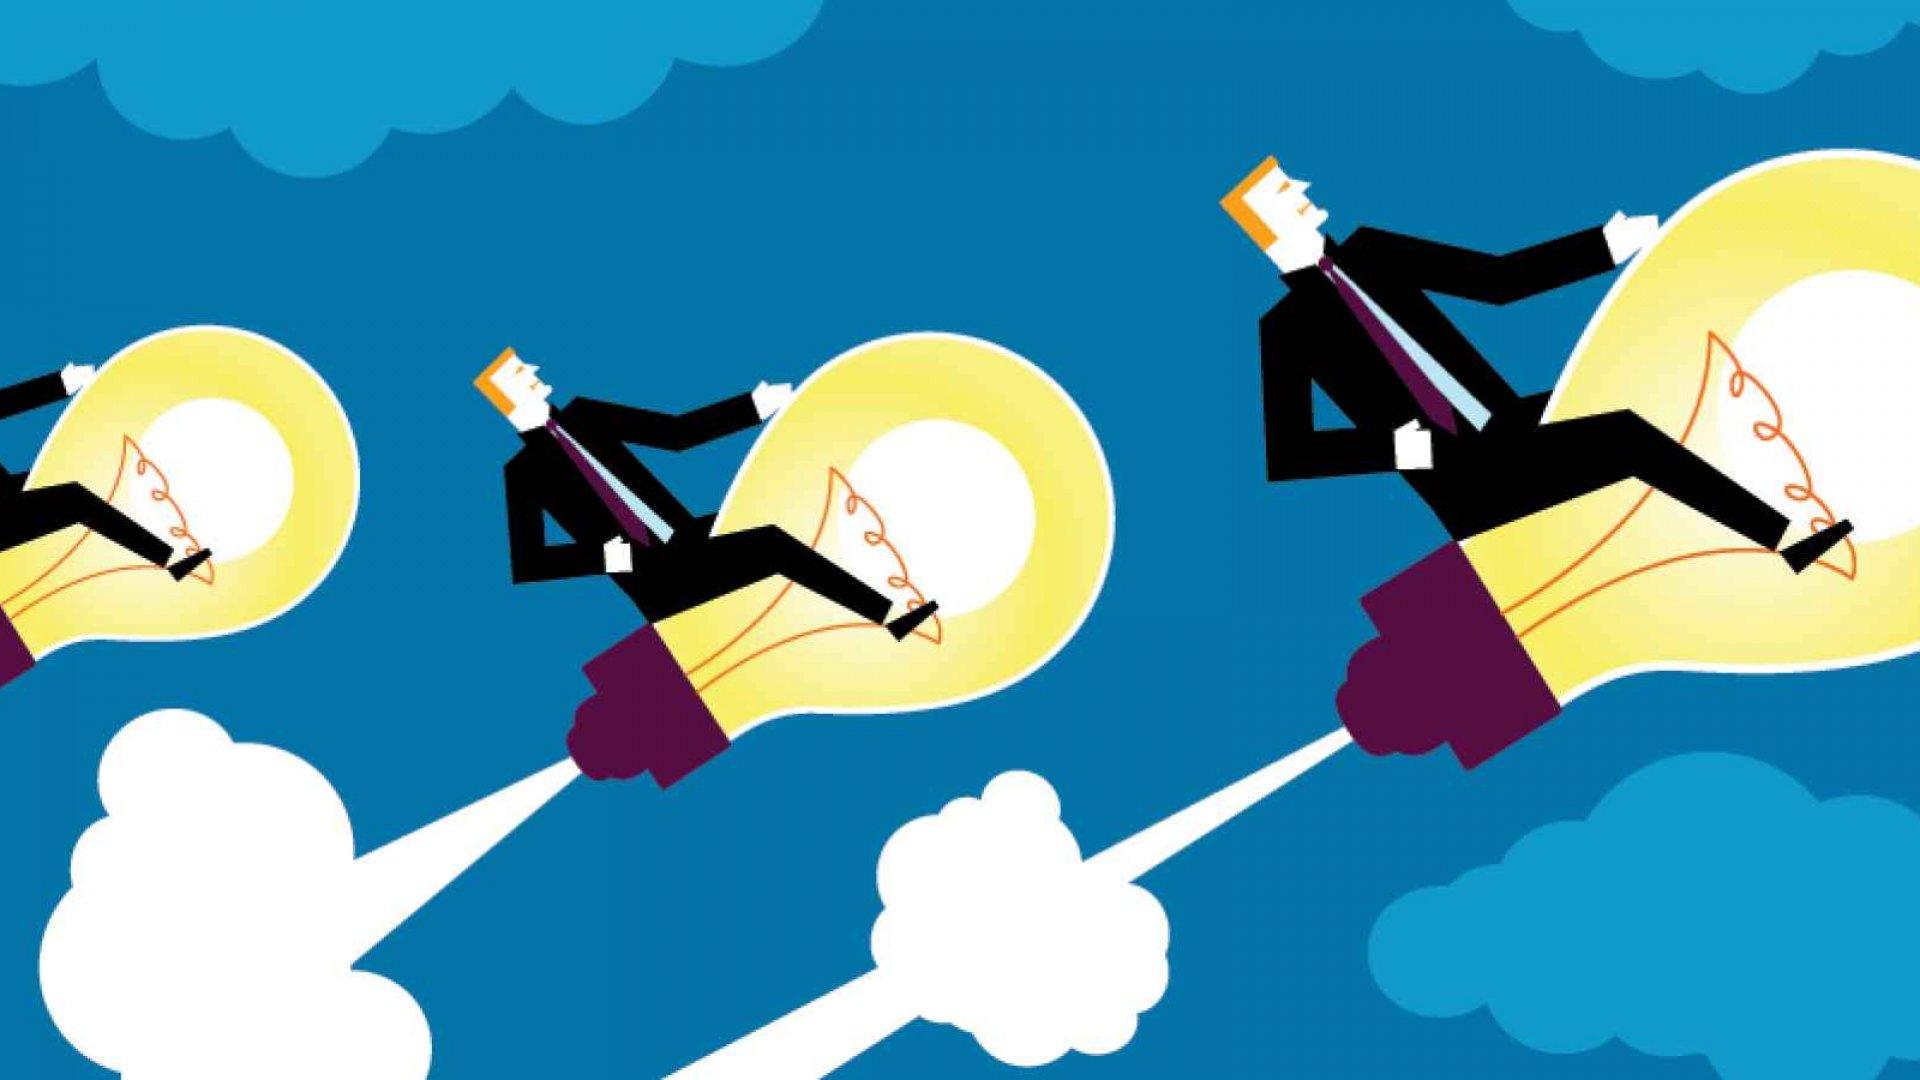 7 Big Ideas That Will Define Business in 2016